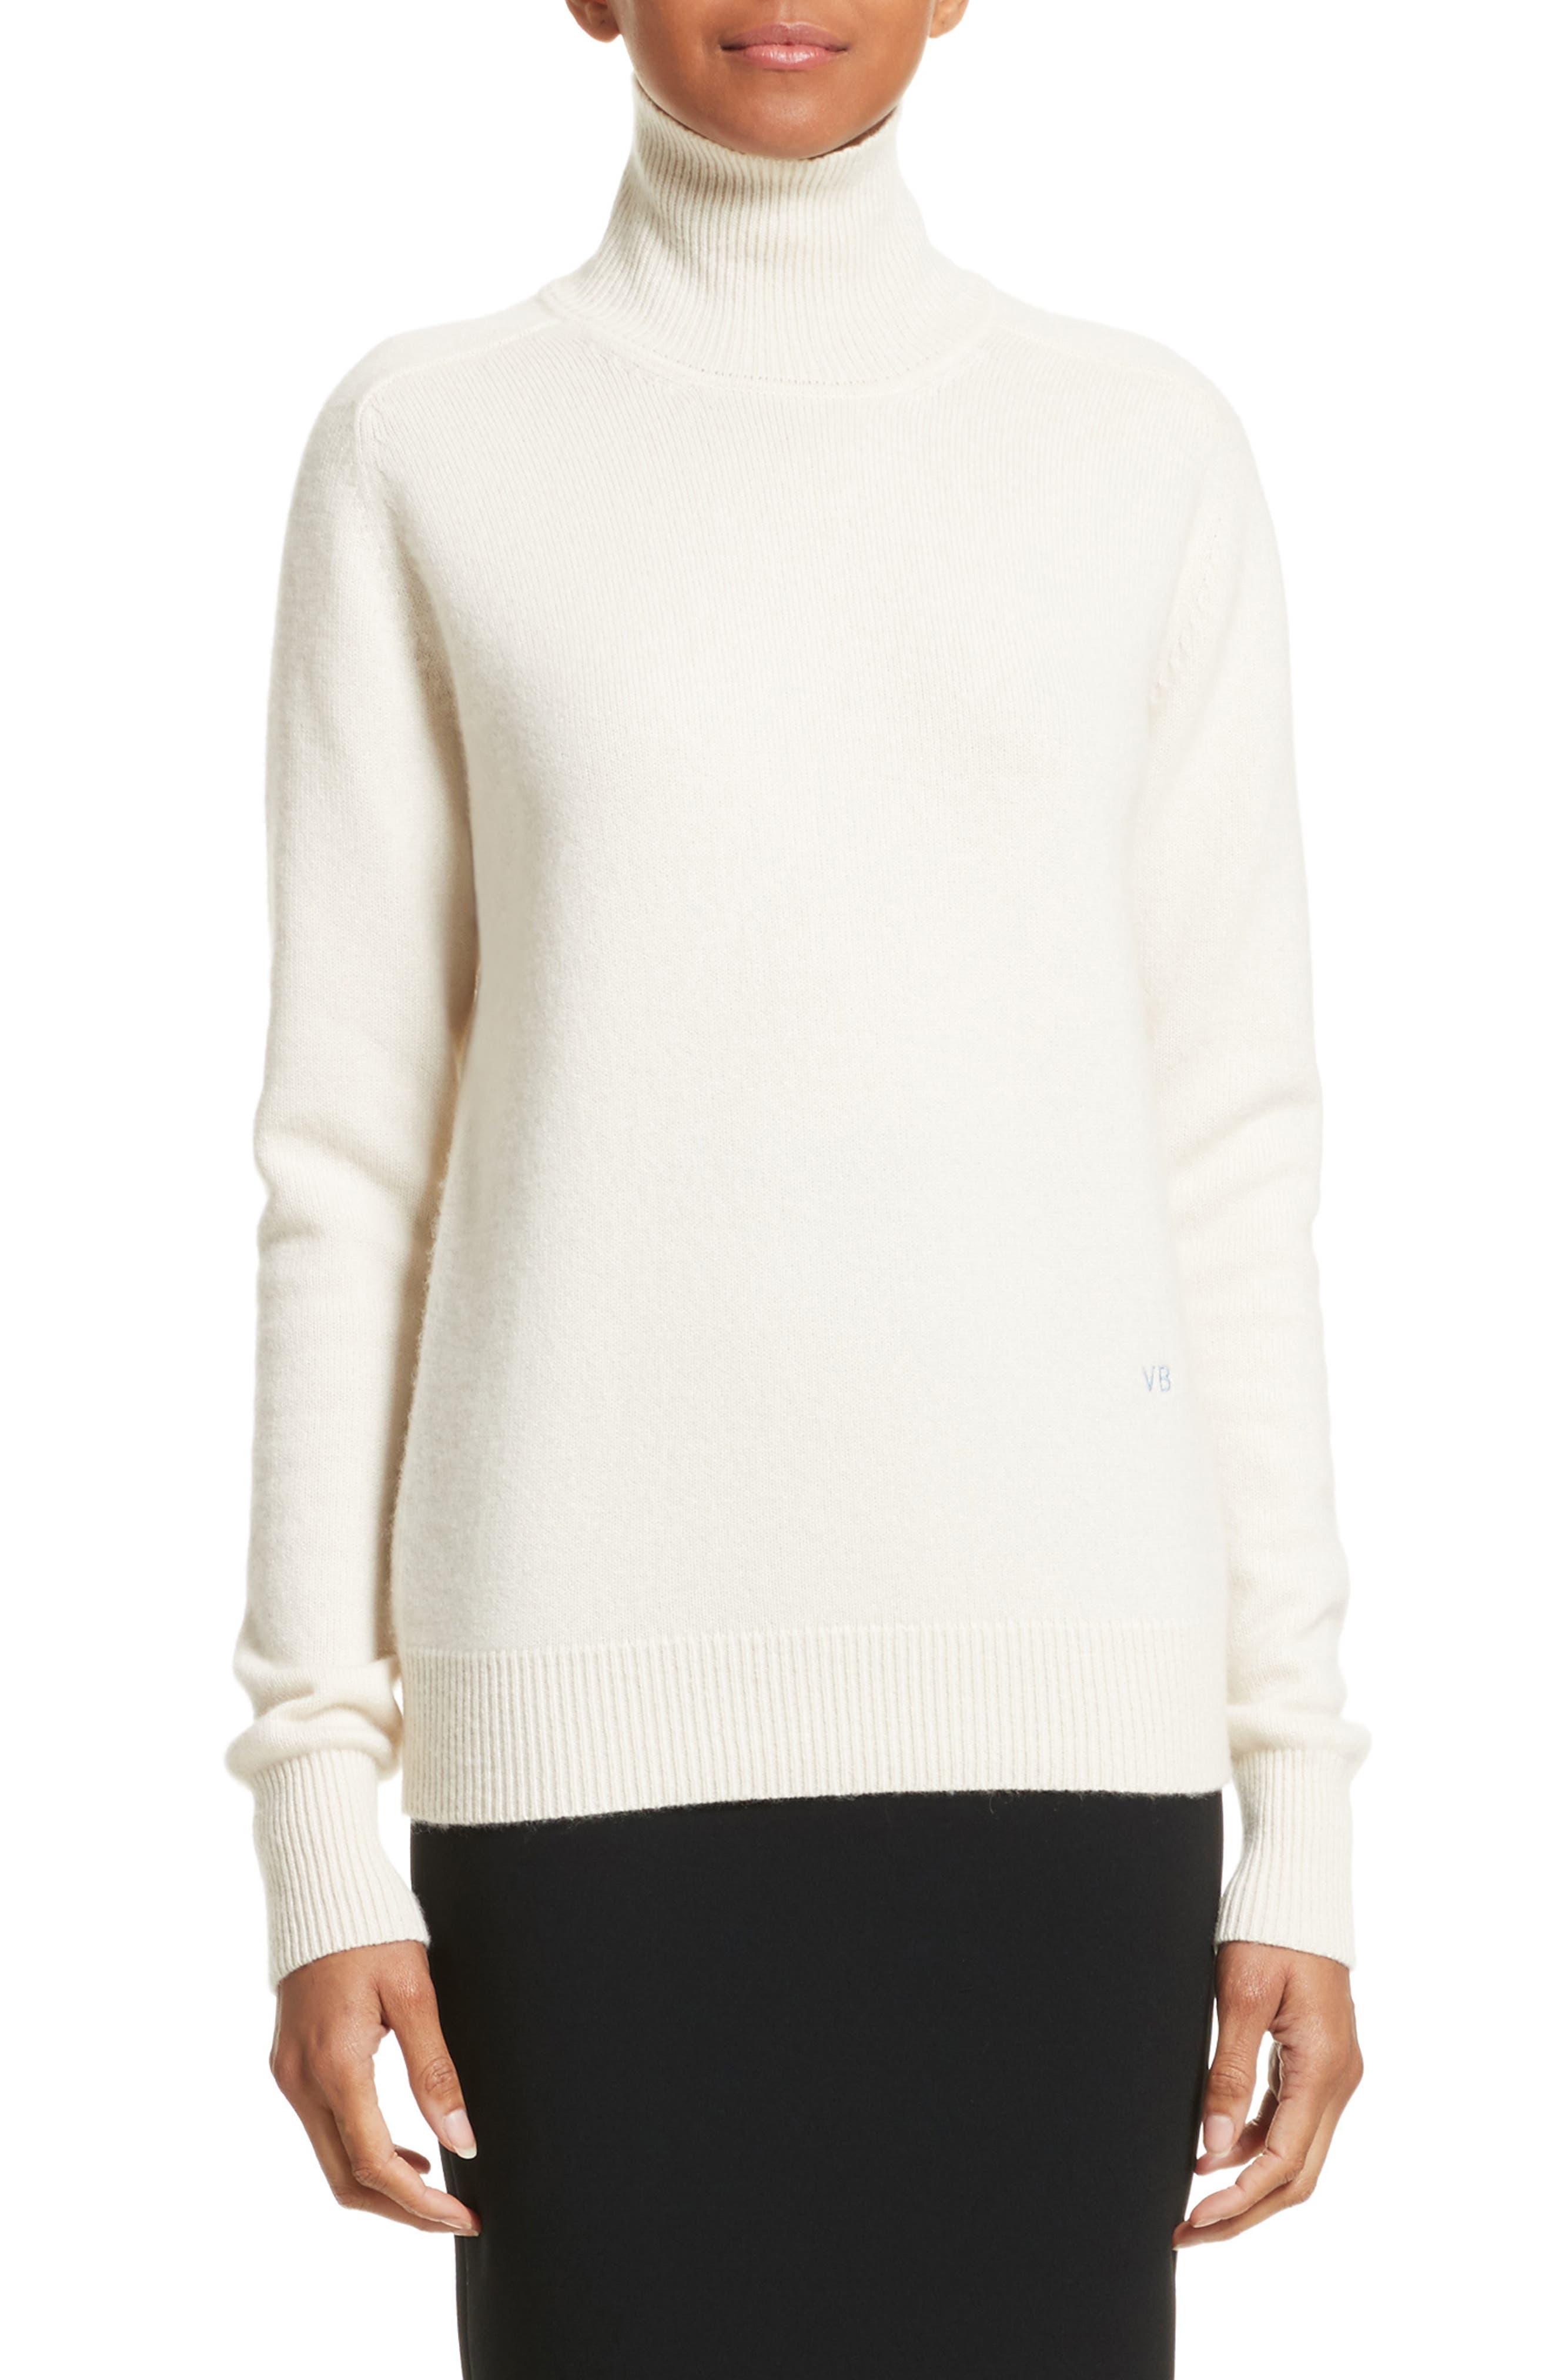 Victoria, Victoria Beckham Woman Embroidered Cotton Sweater White Size 14 Victoria Beckham